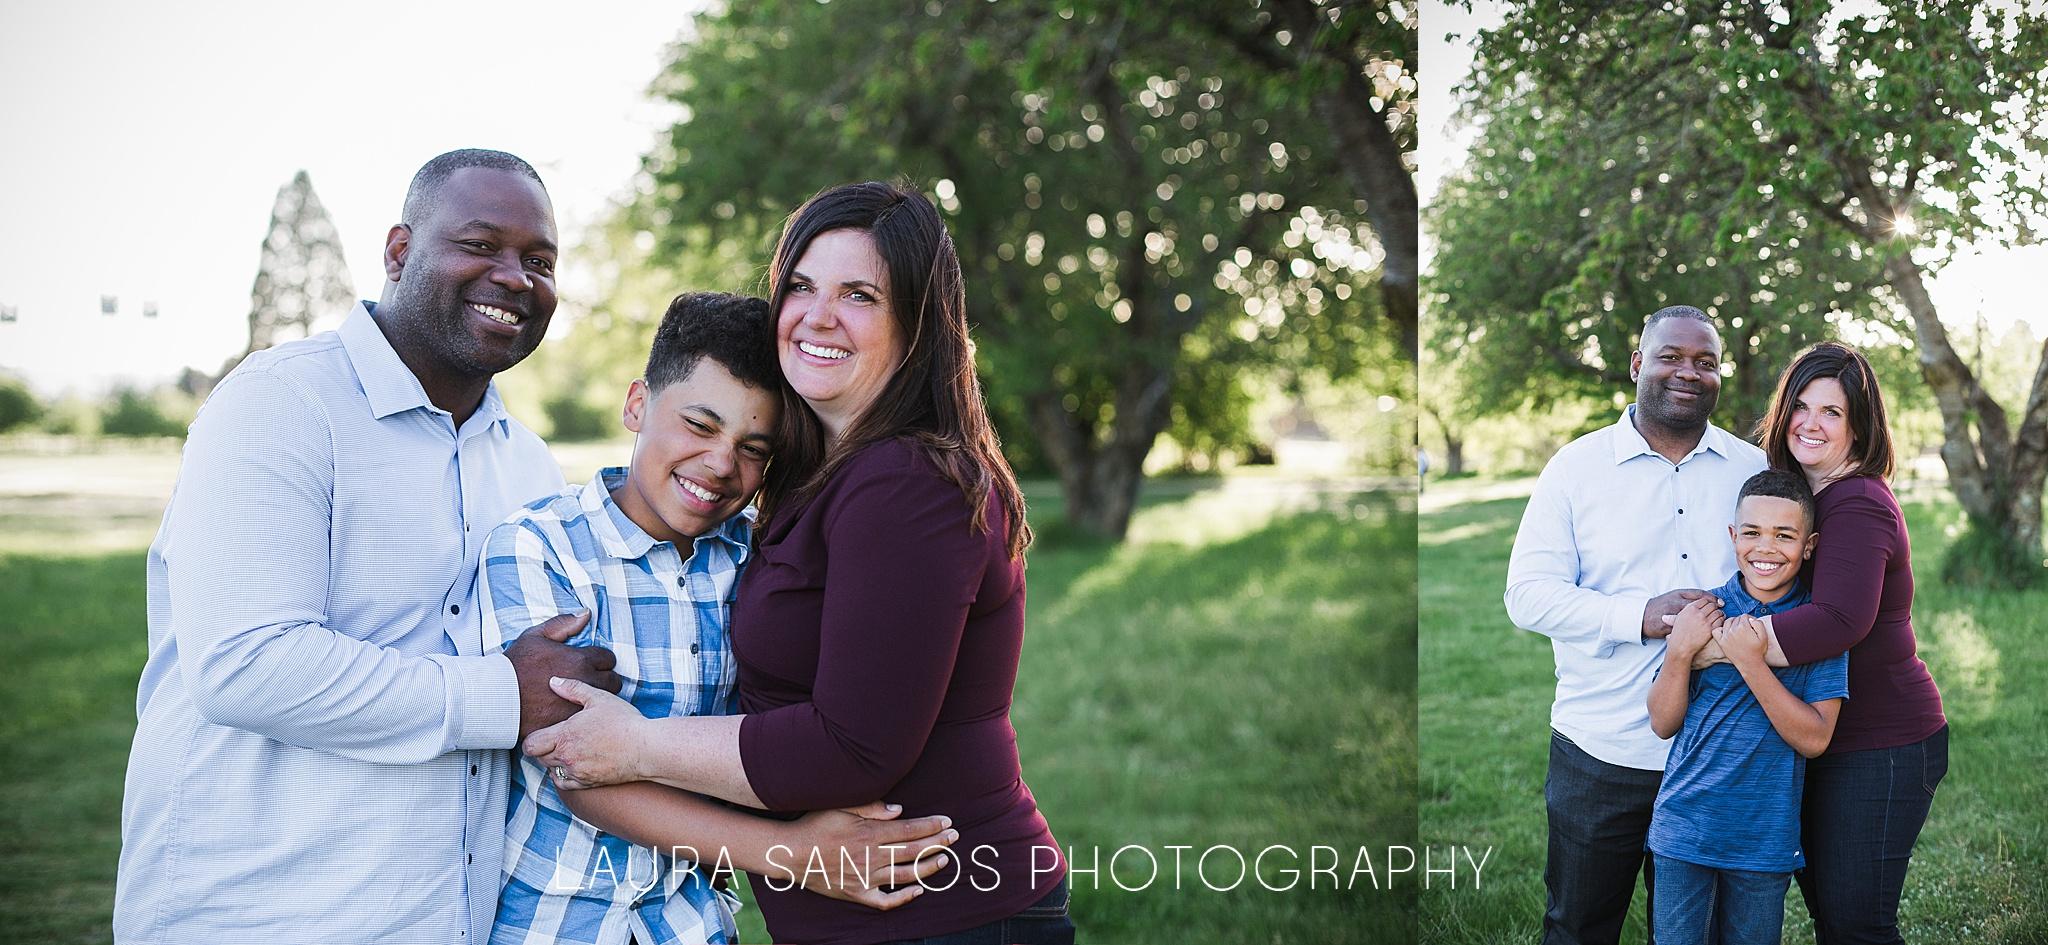 Family-Photographer-Portland — Blog — Laura Santos Photography